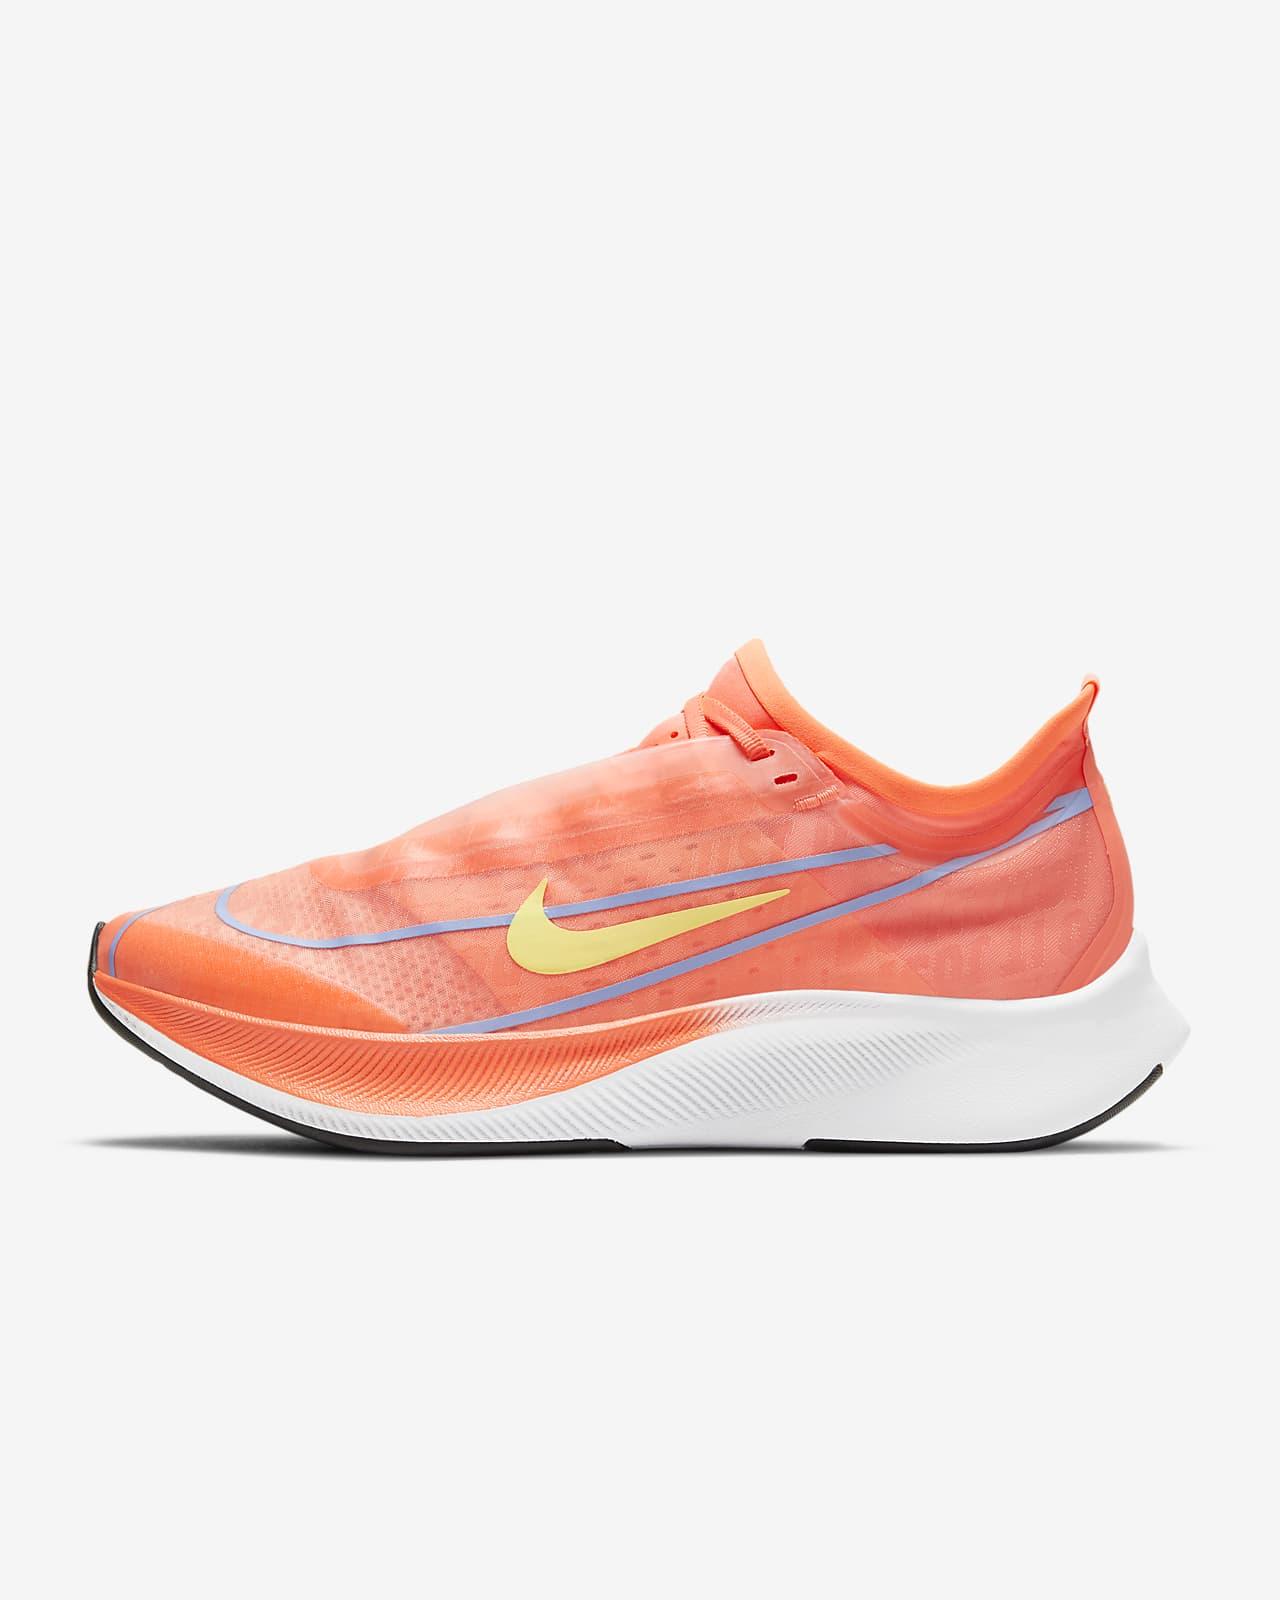 Nike Zoom Fly 3 Women's Running Shoe